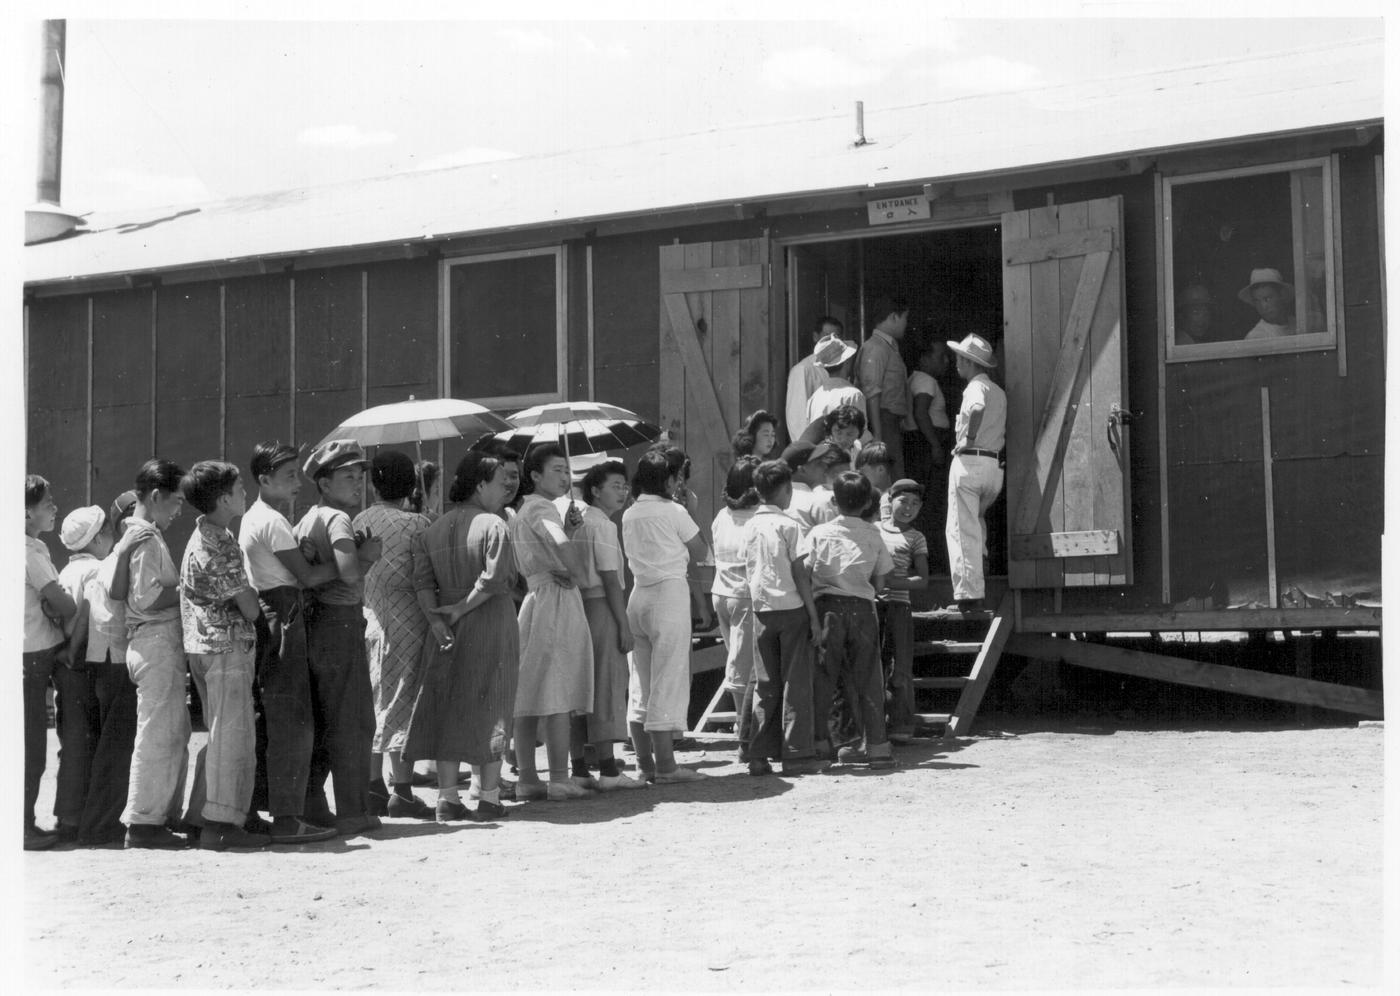 Grupo de inmigrantes entrando a un tren de Dorothea Lange